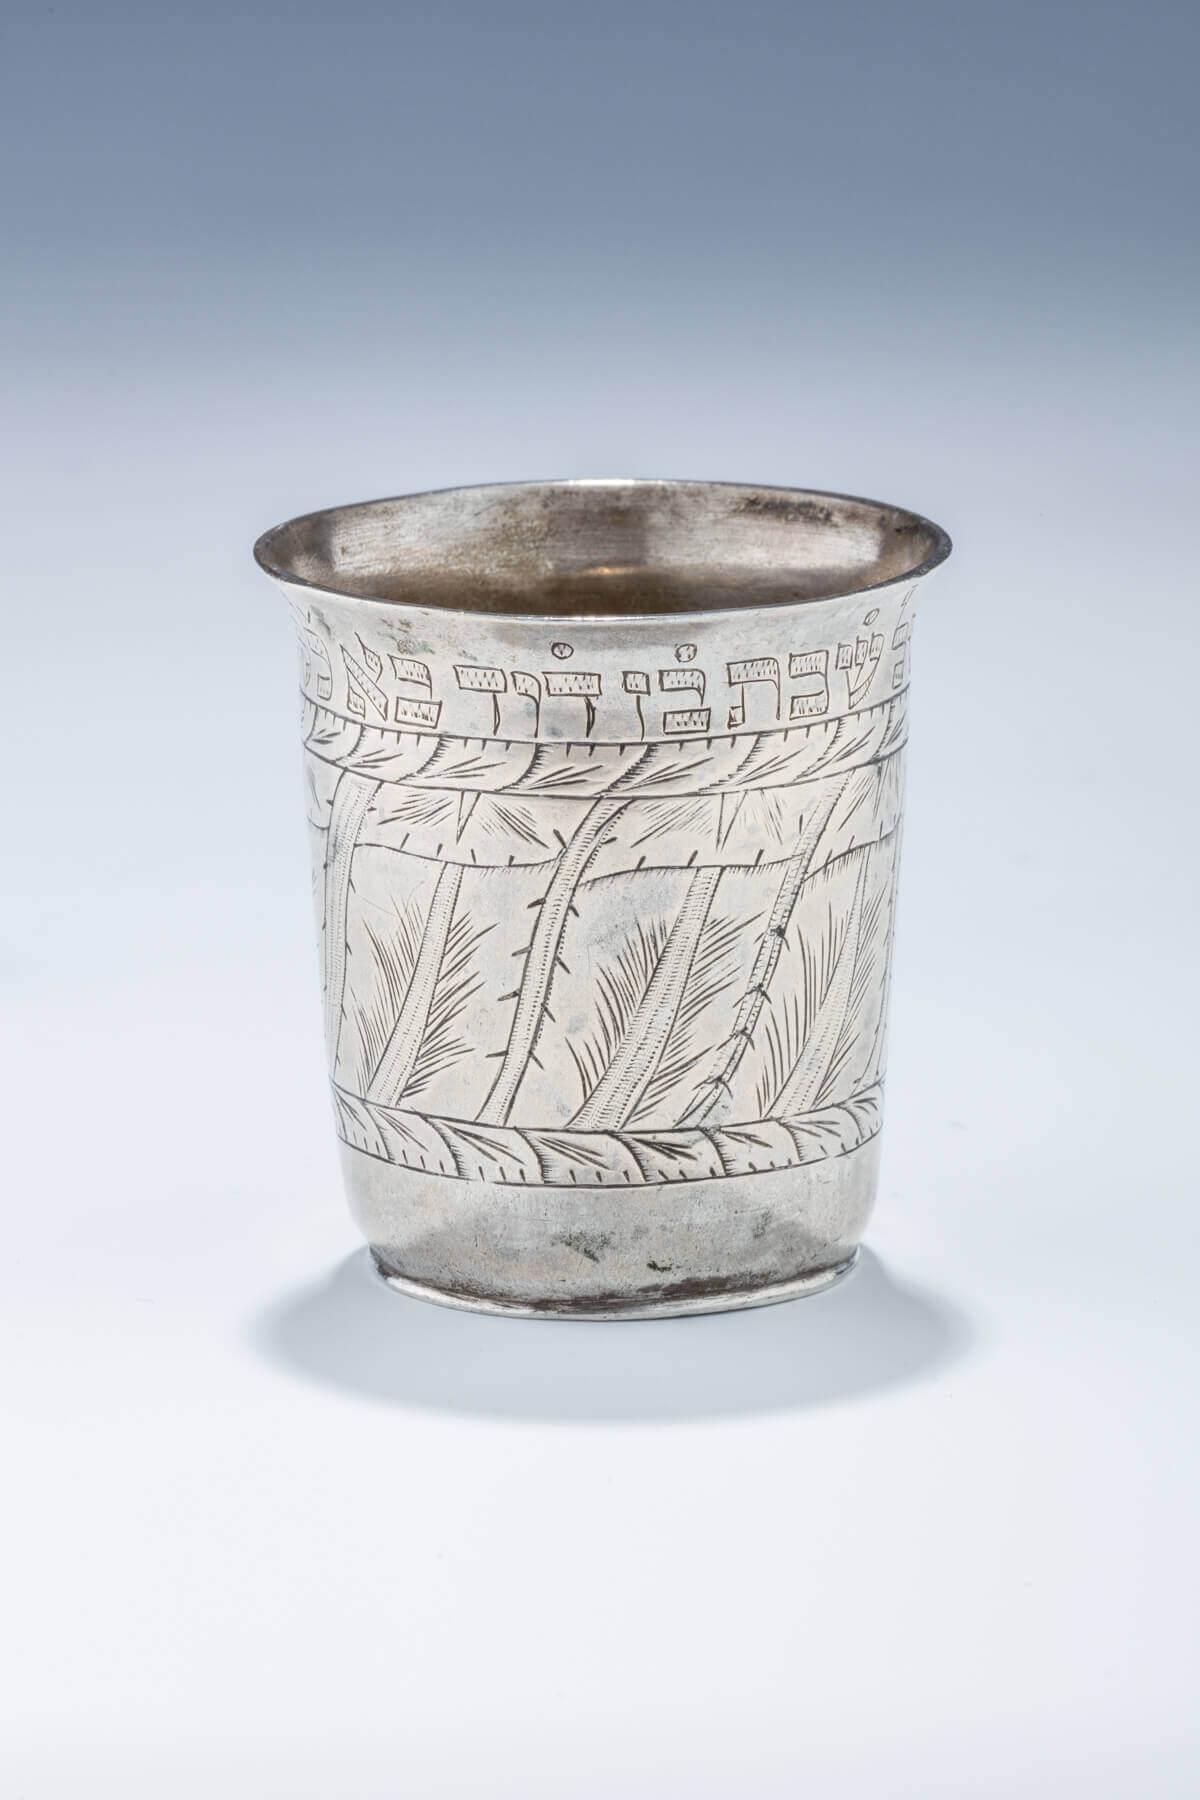 065. A SILVER SHMIROT KIDDUSH CUP